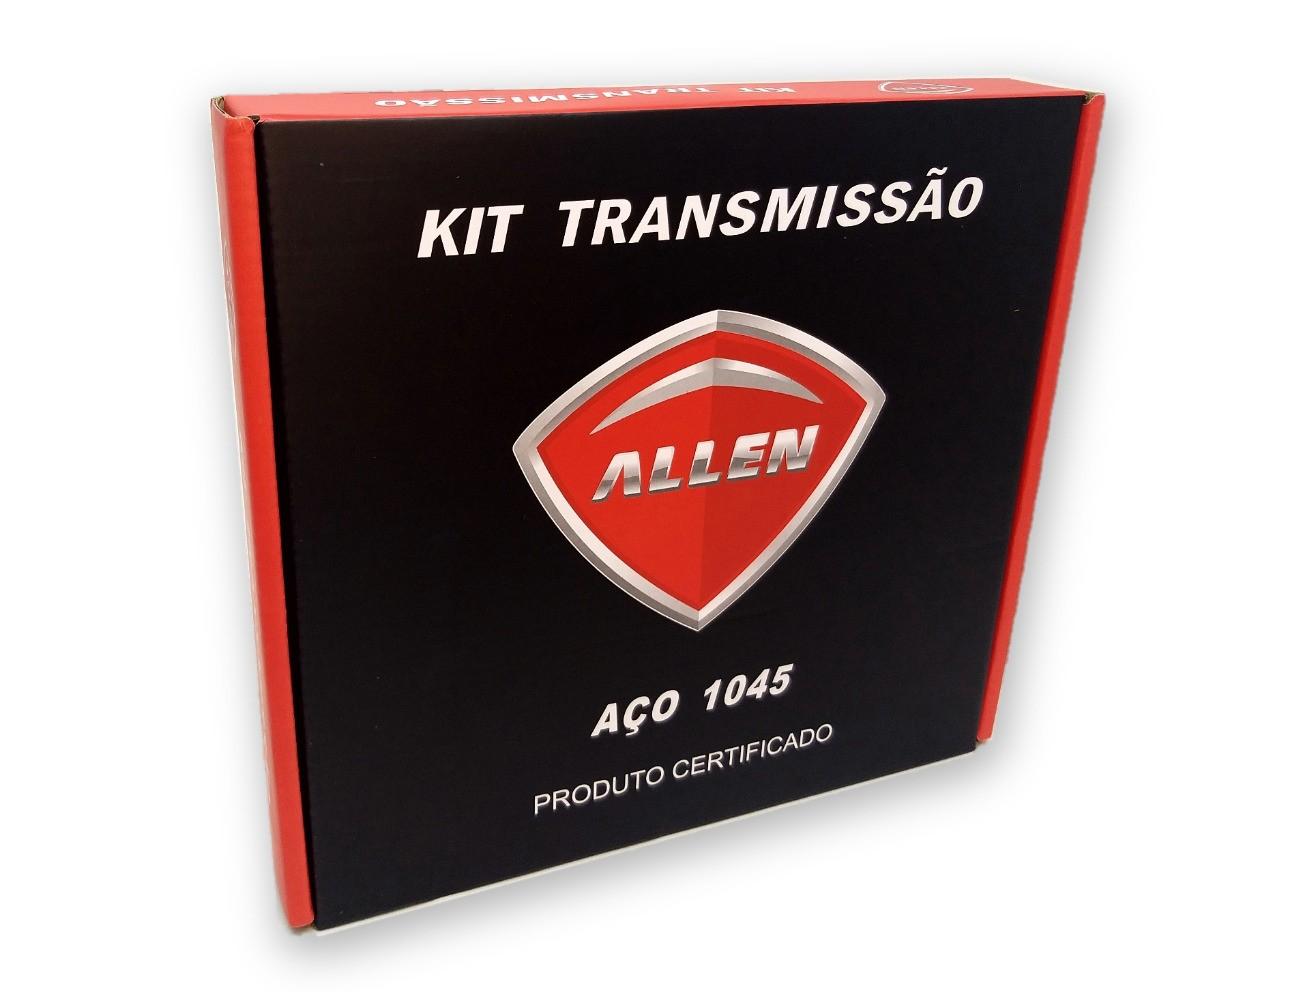 Kit Relação Suzuki Yes / Intruder 125 Aço 1045 Allen 428x116x43x14